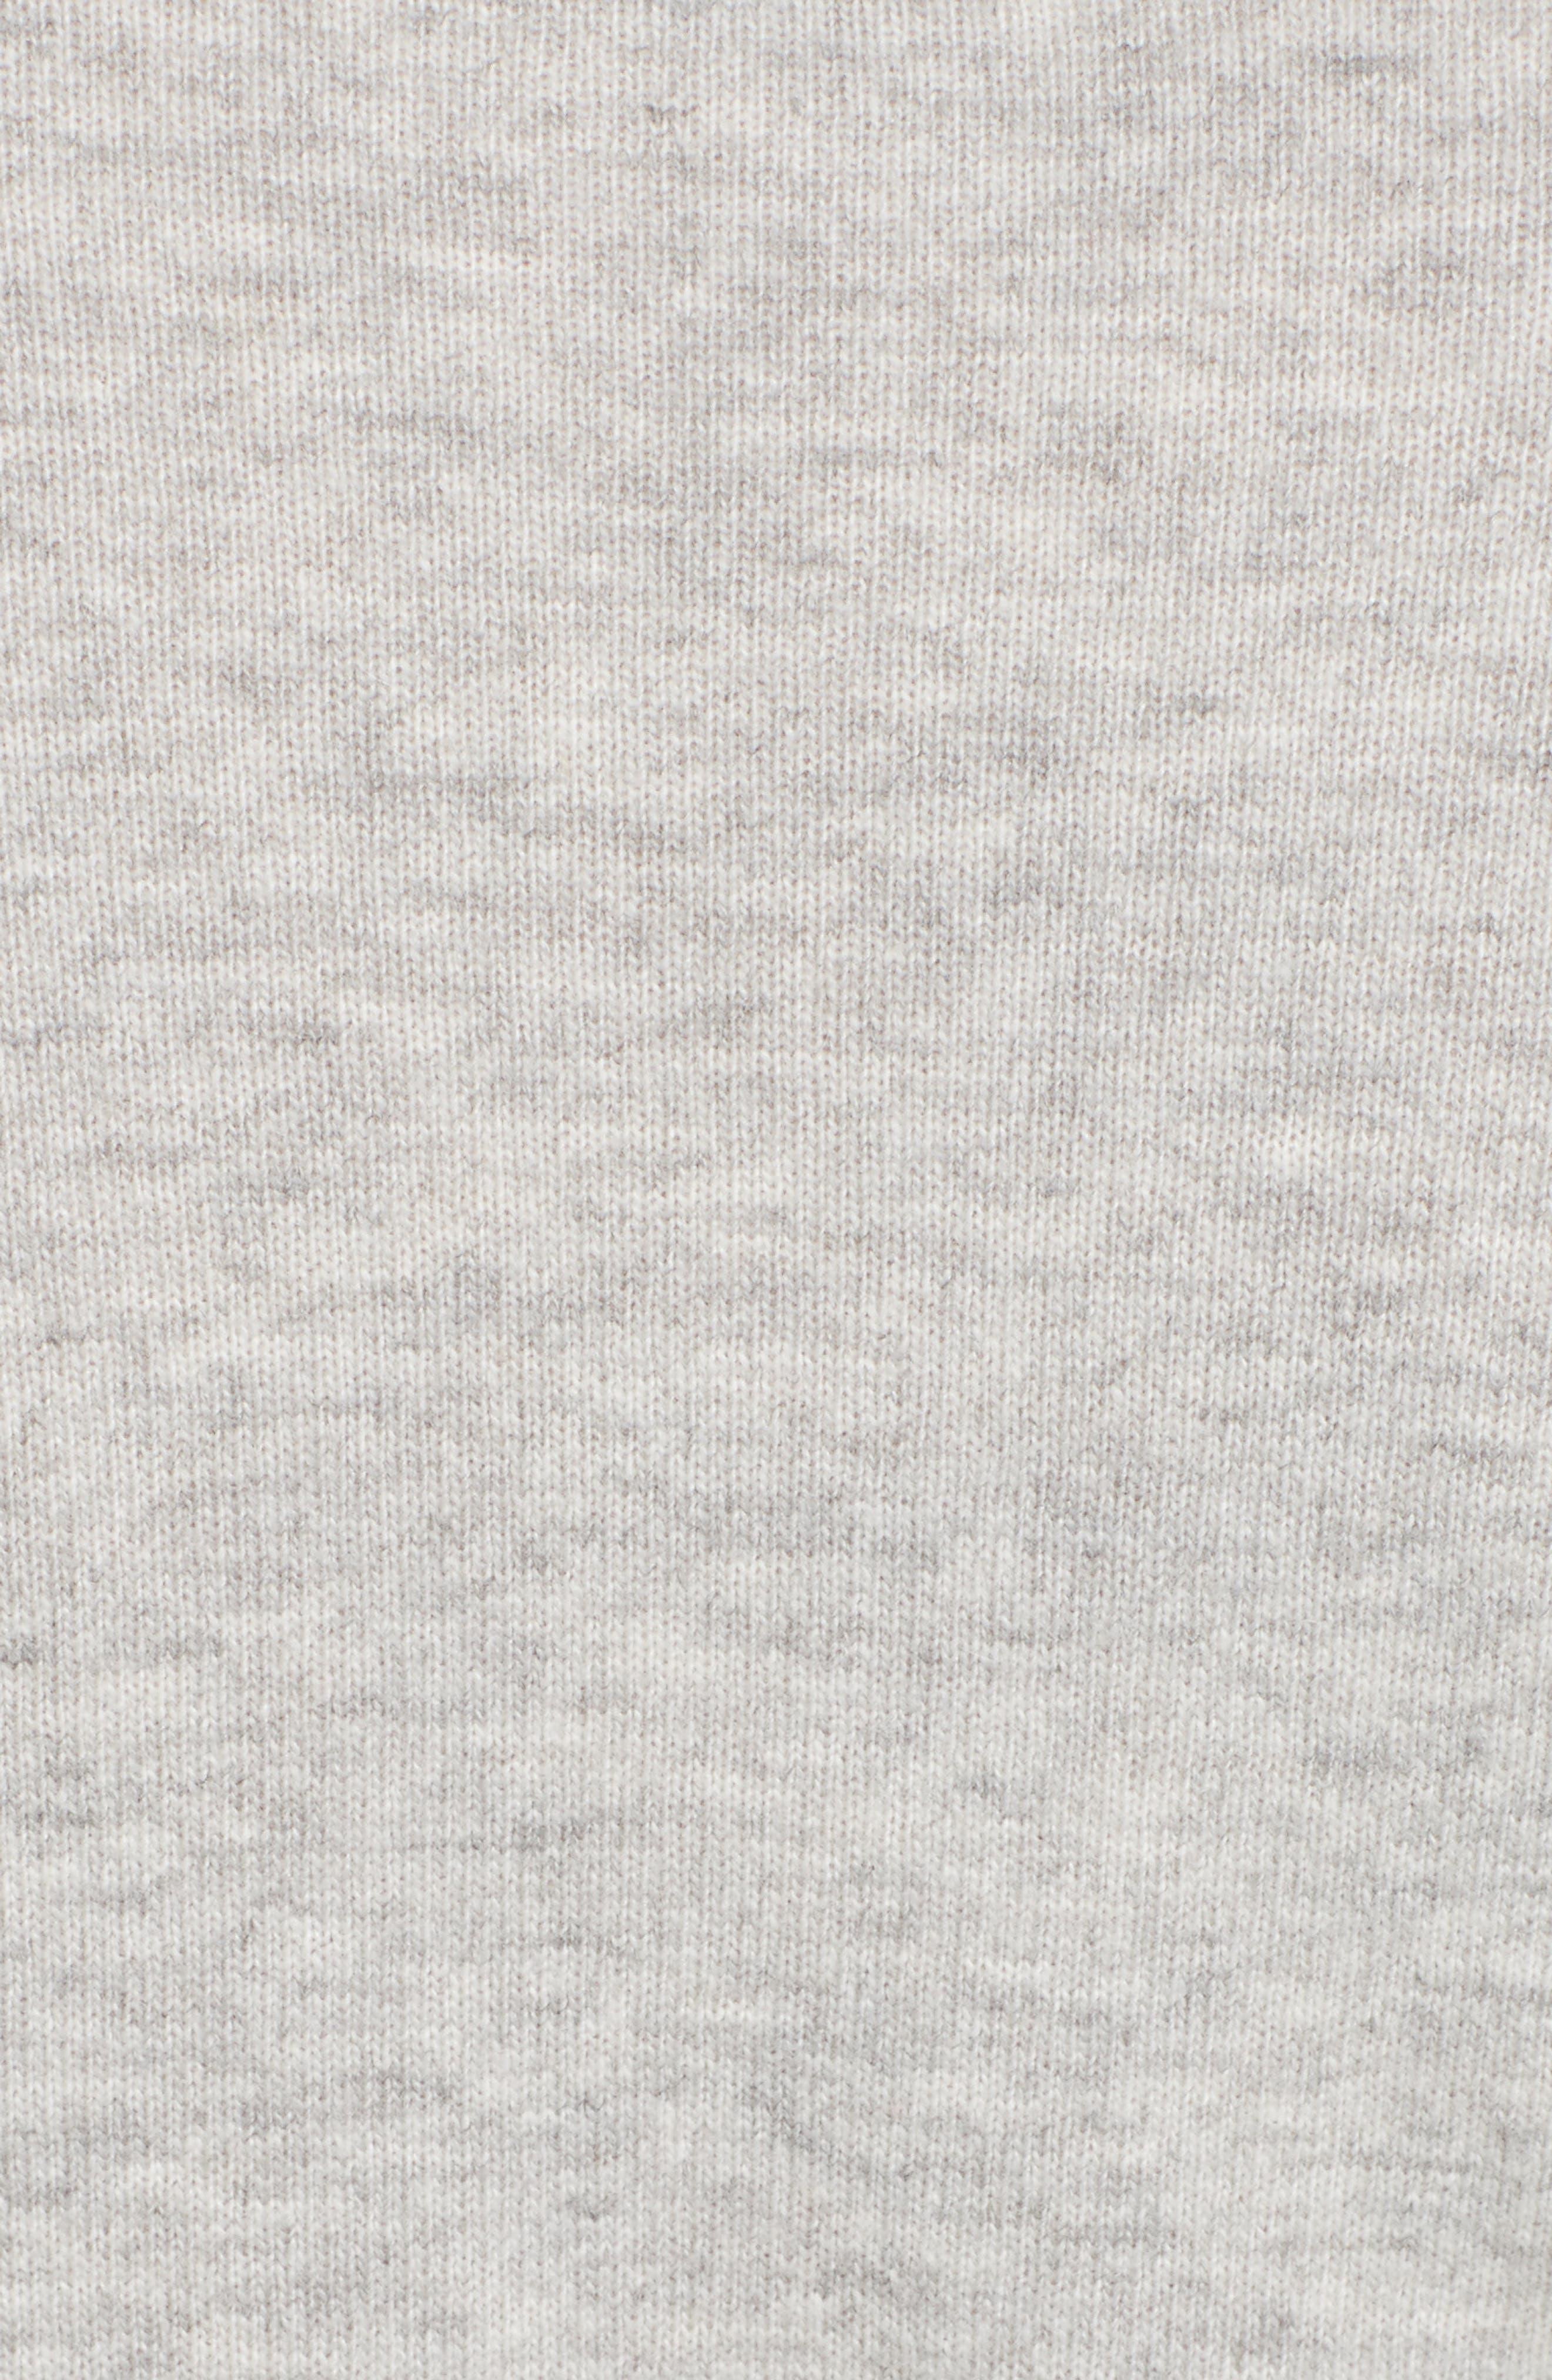 Bretta Sweater,                             Alternate thumbnail 5, color,                             030